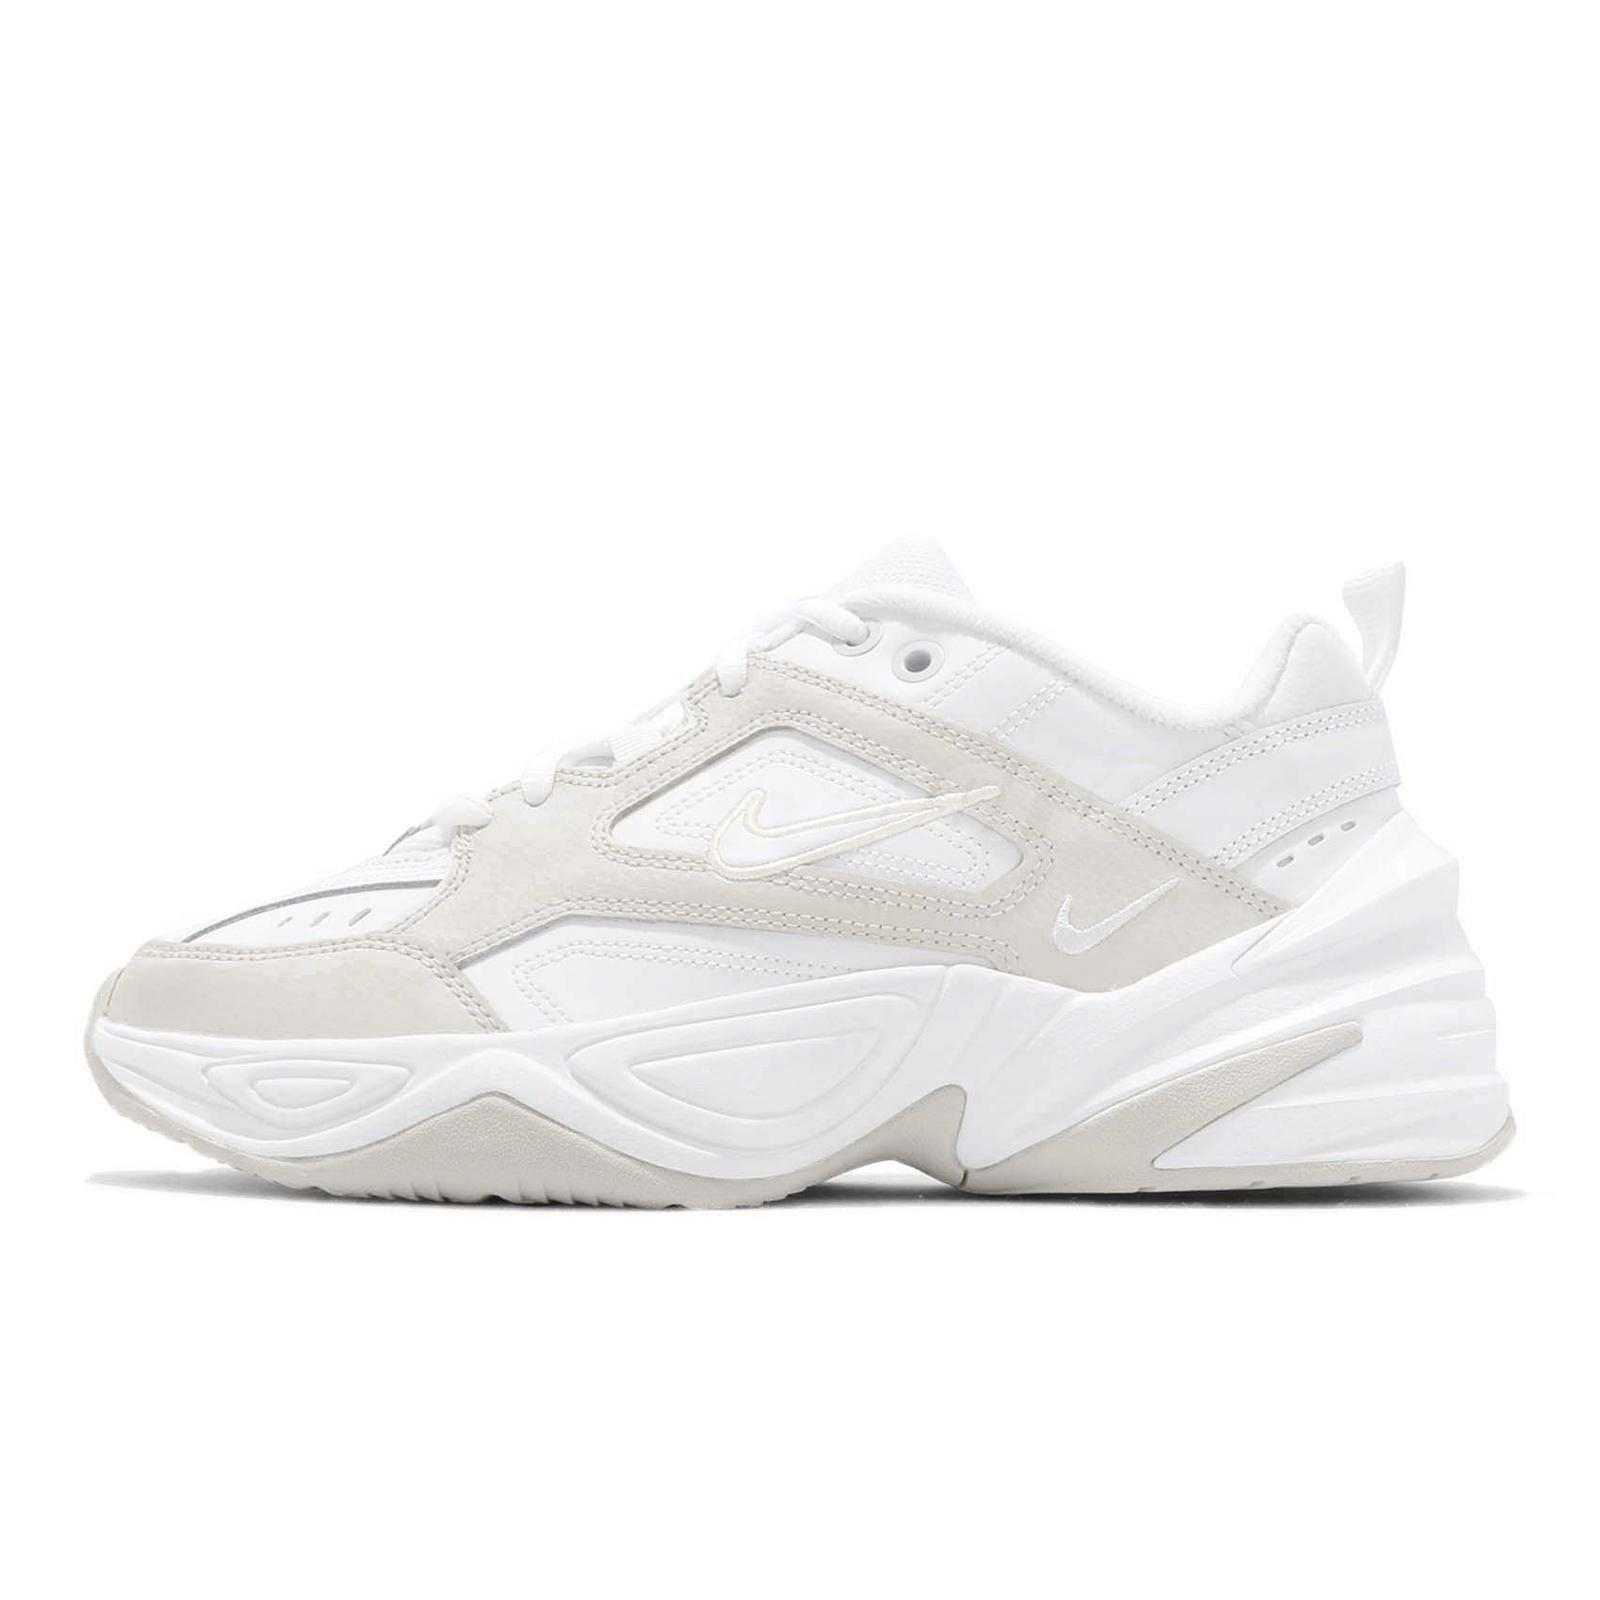 00eb0cb05 Nike Wmns M2K Tekno Phantom White Women Casual Daddy Shoes Sneakers AO3108 -006